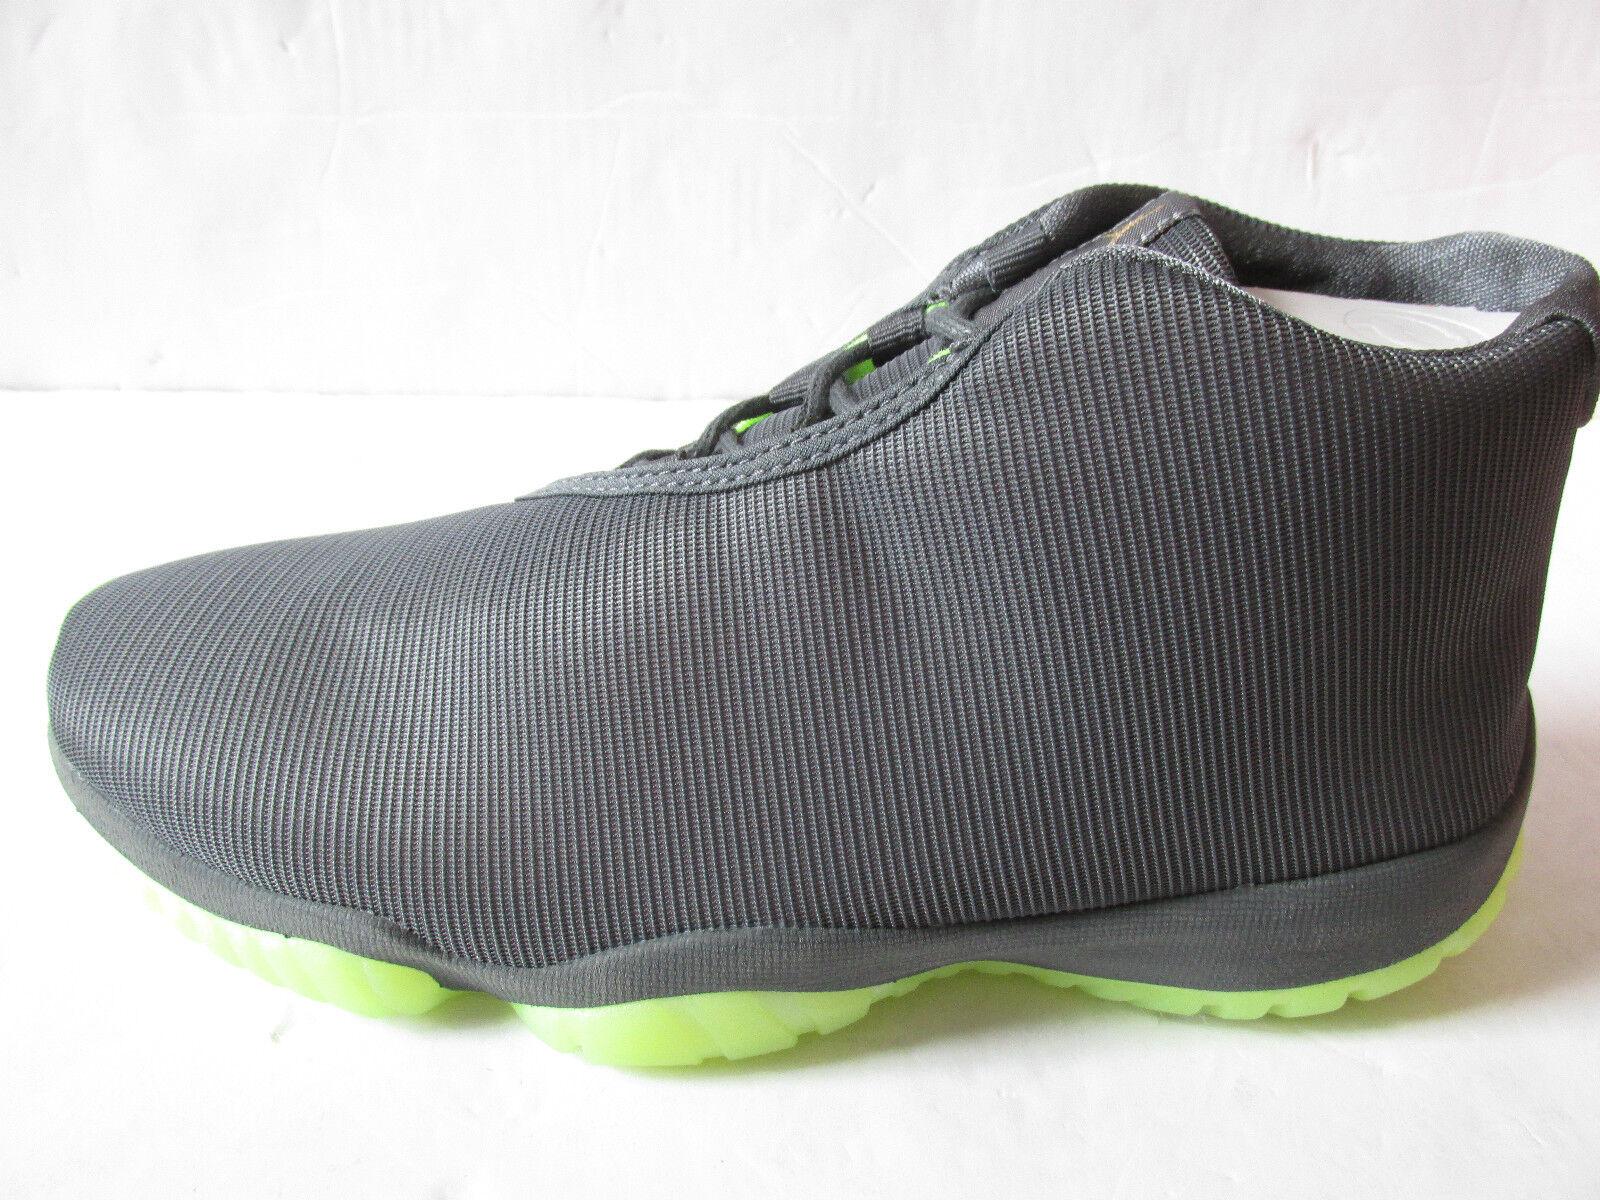 nike air top jordan future homme hi top air basketball trainers 656503 025 Baskets chaussures 204349